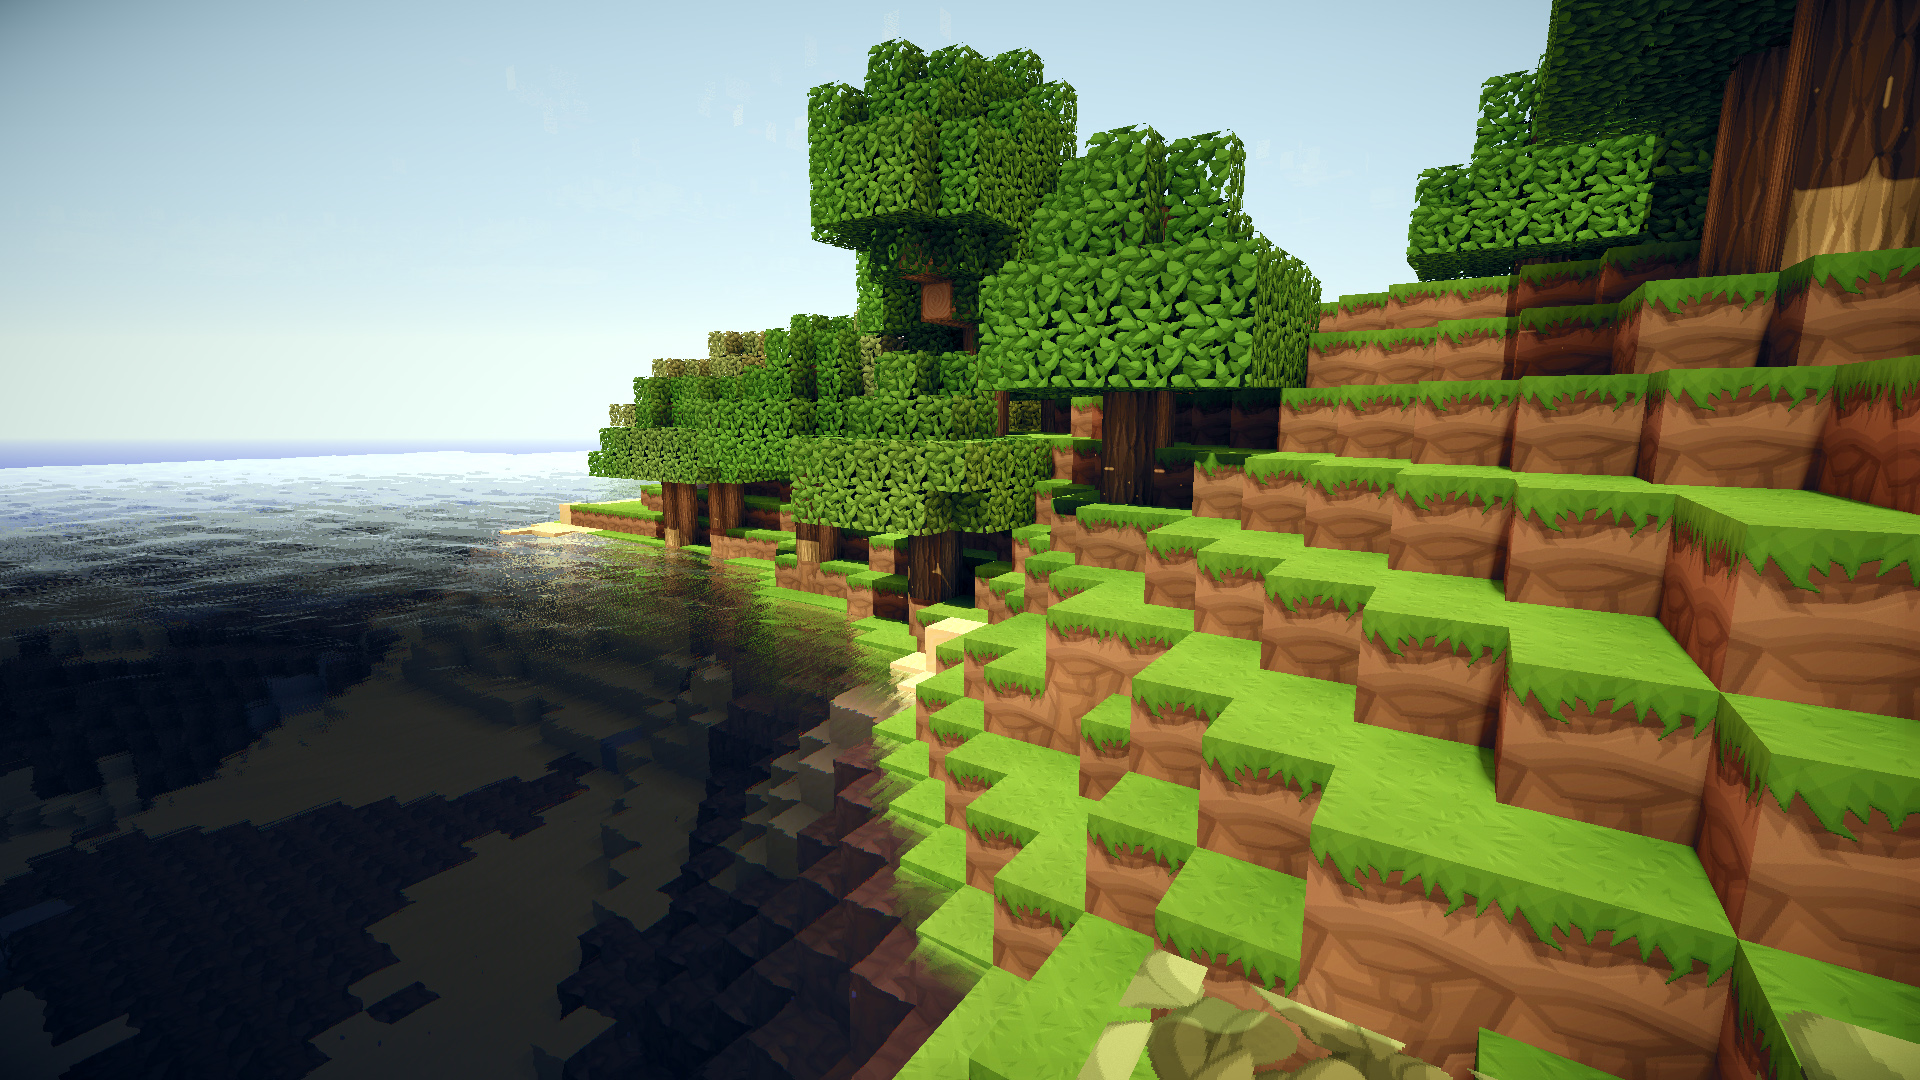 minecraft wallpaper hd,biome,video game software,tree,grass,software